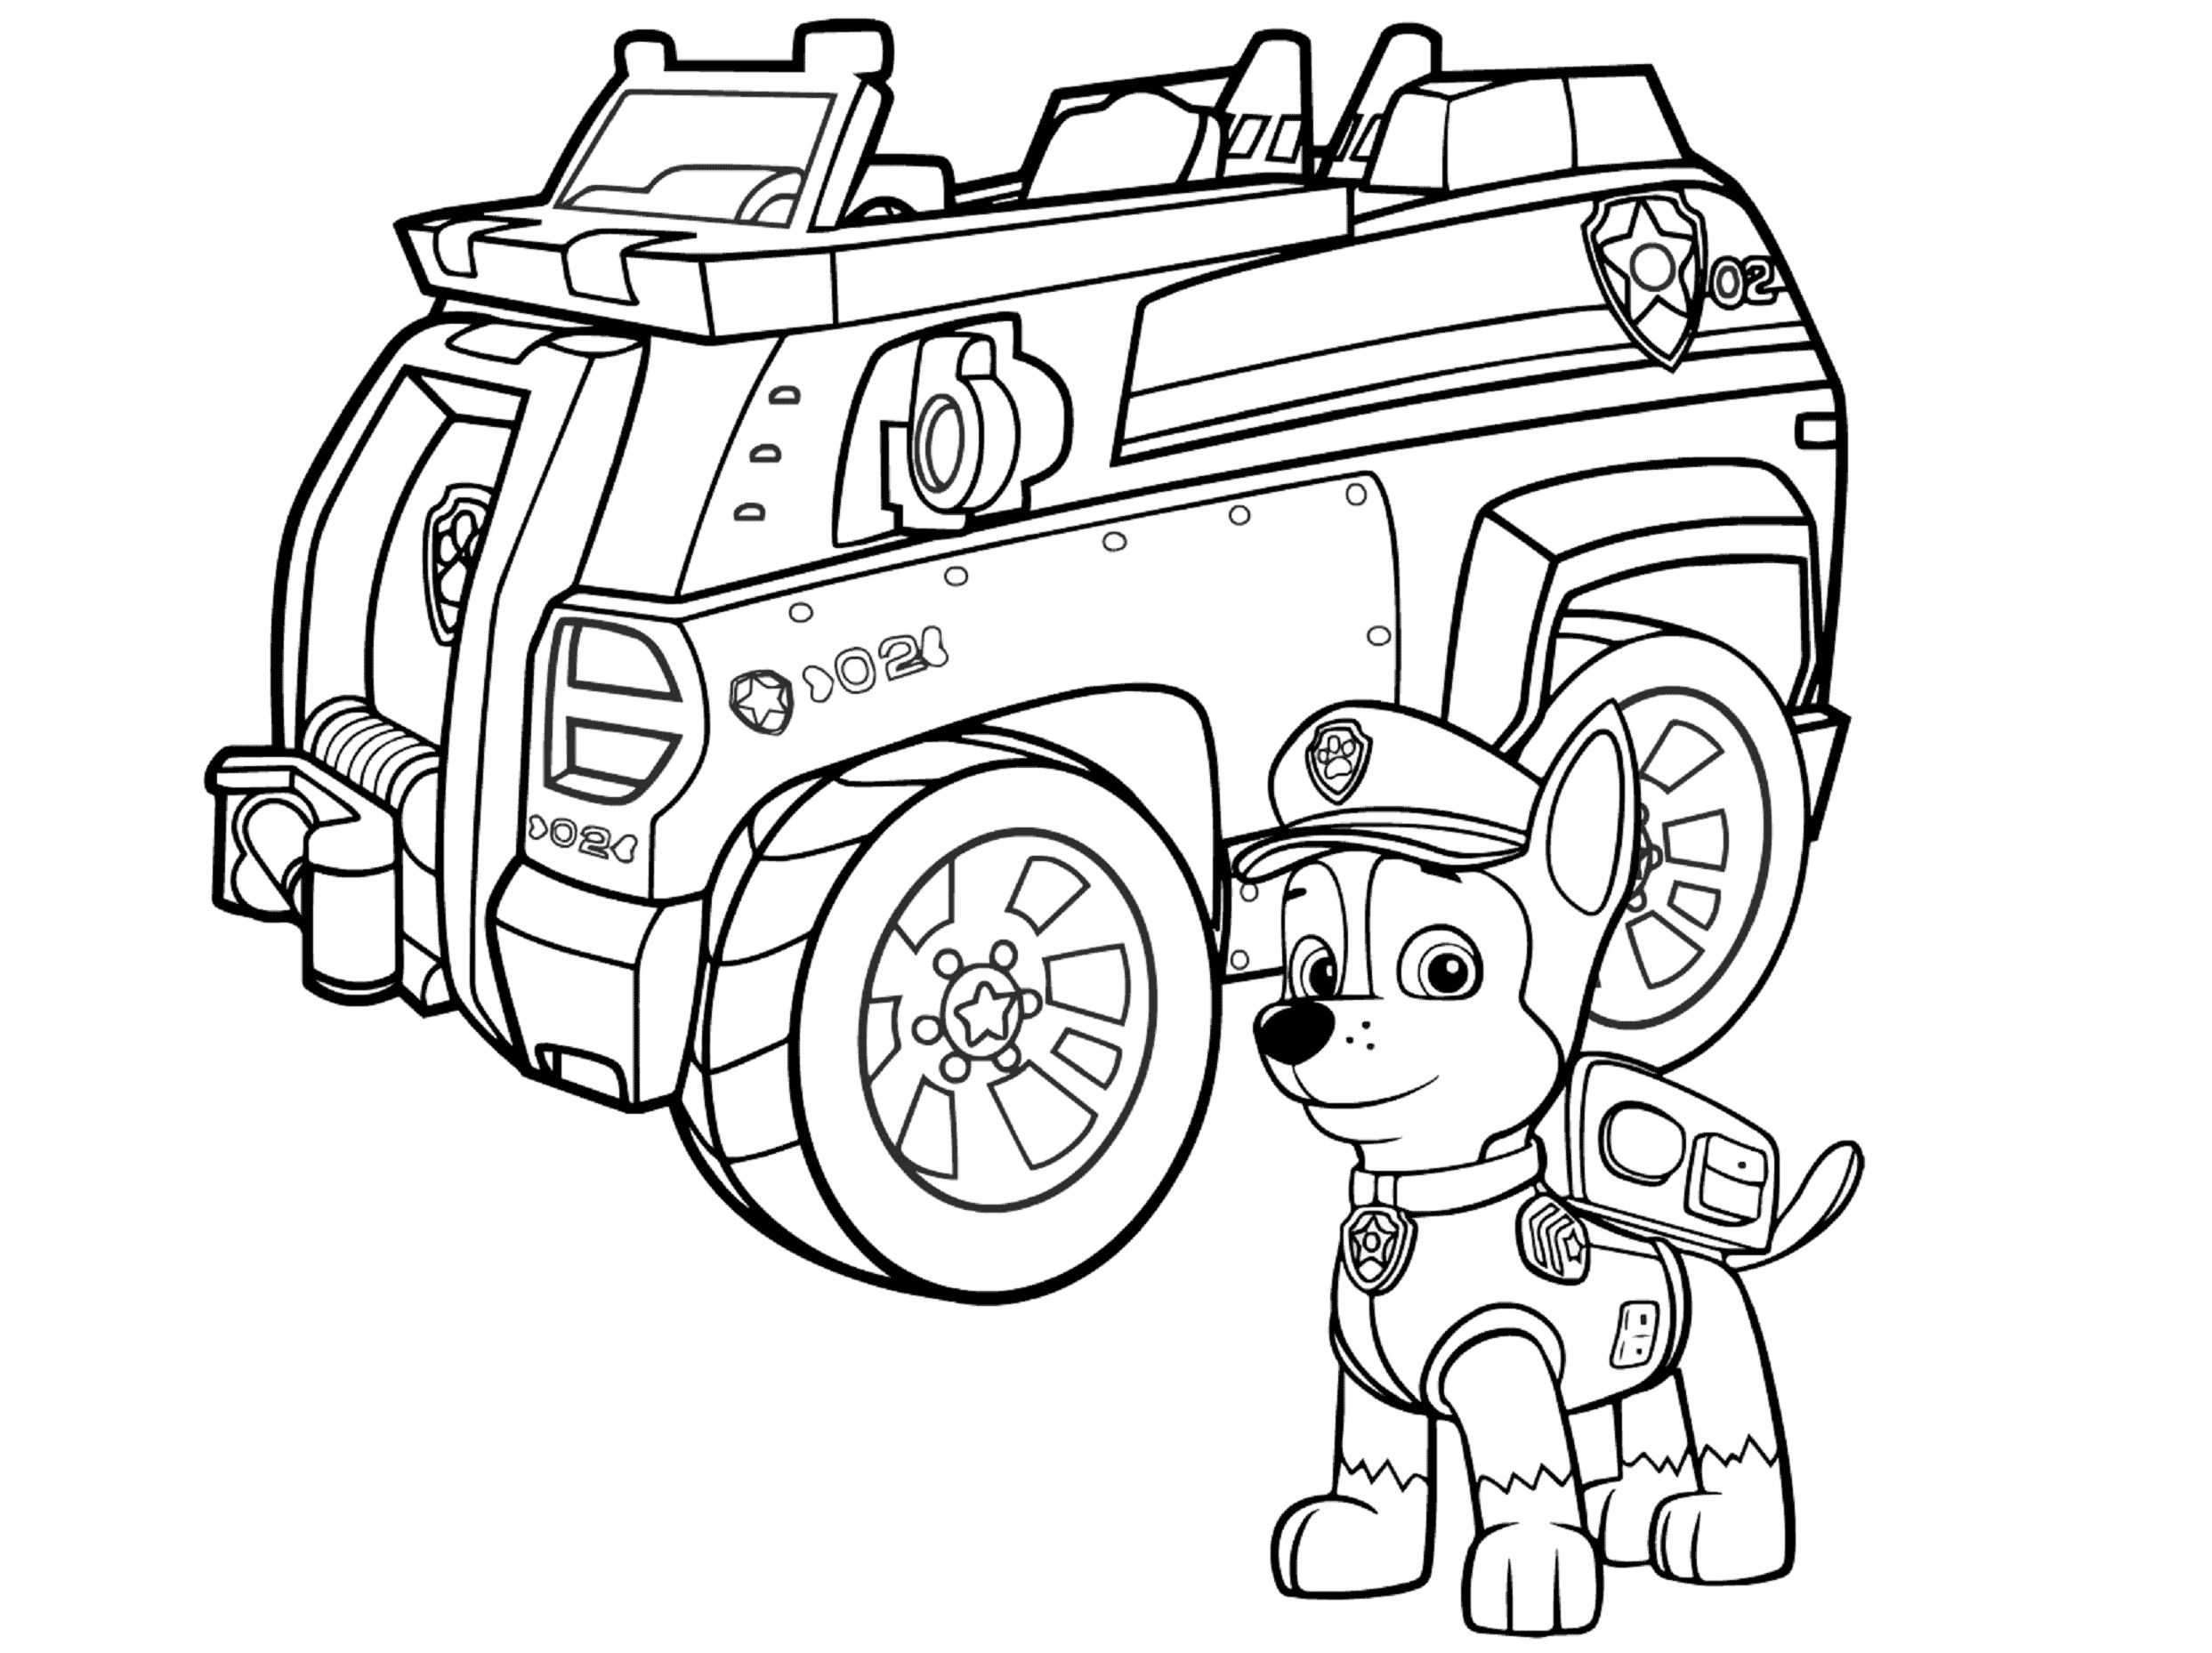 Kleurplaten Politieauto.Aw Patrol Kleurplaat Chase Met Politie Auto Paw Patrol